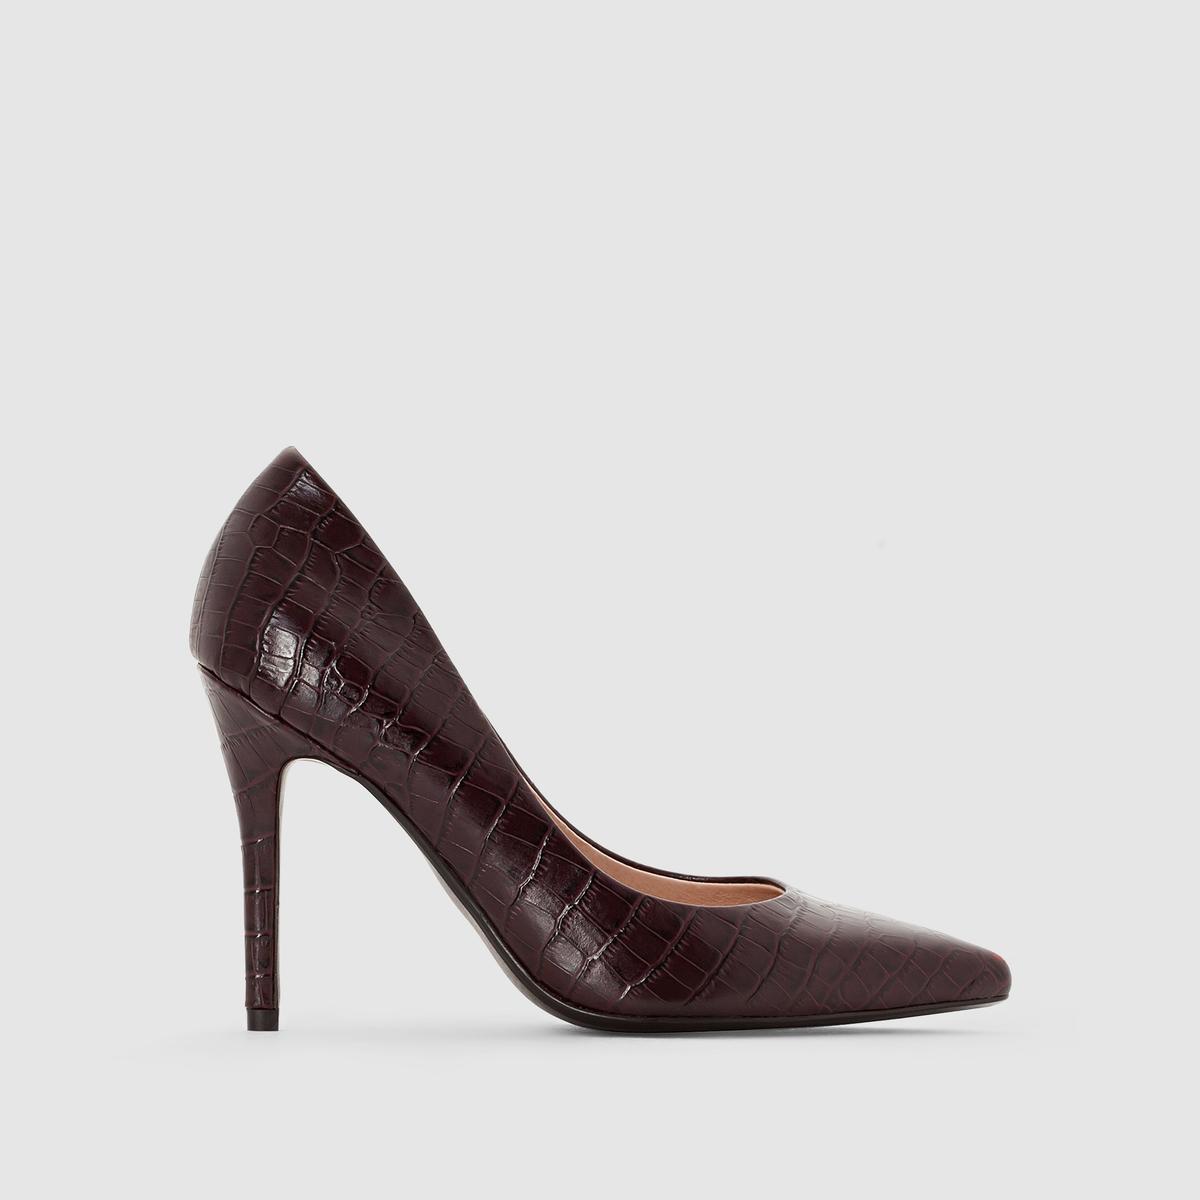 Туфли-лодочки под крокодиловую кожу